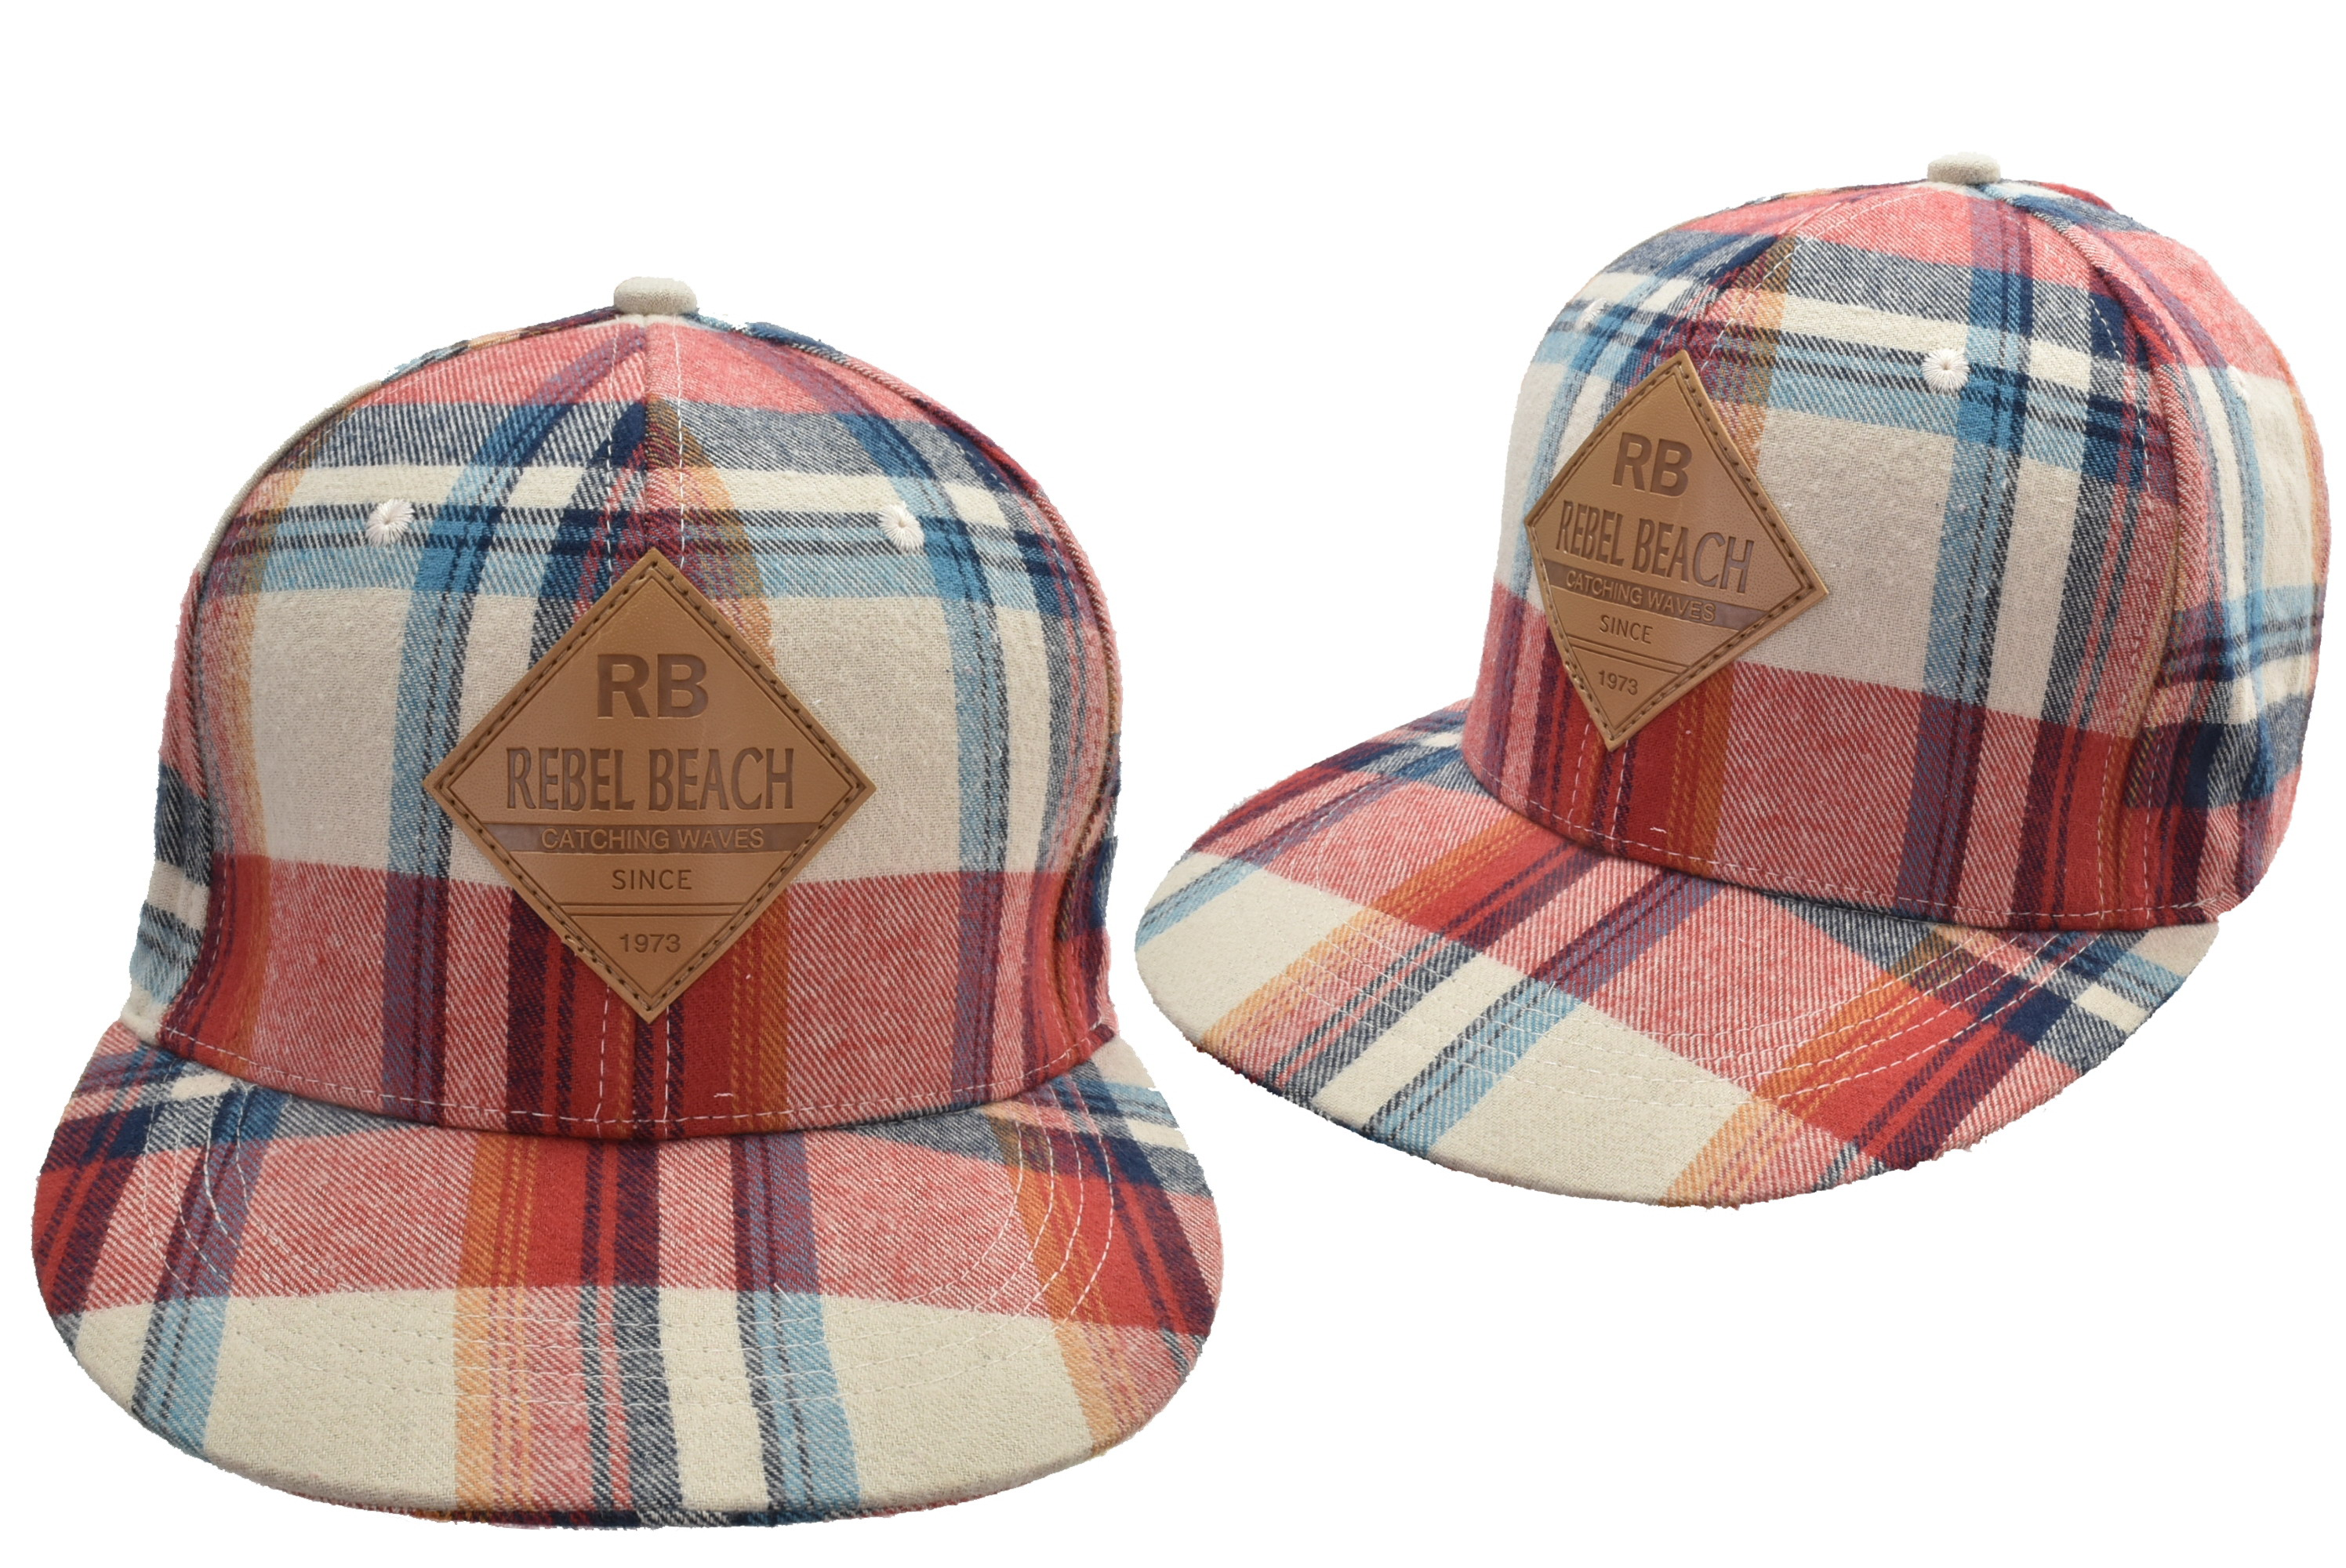 Cotton Flat Cap Check Design Rebel Beach